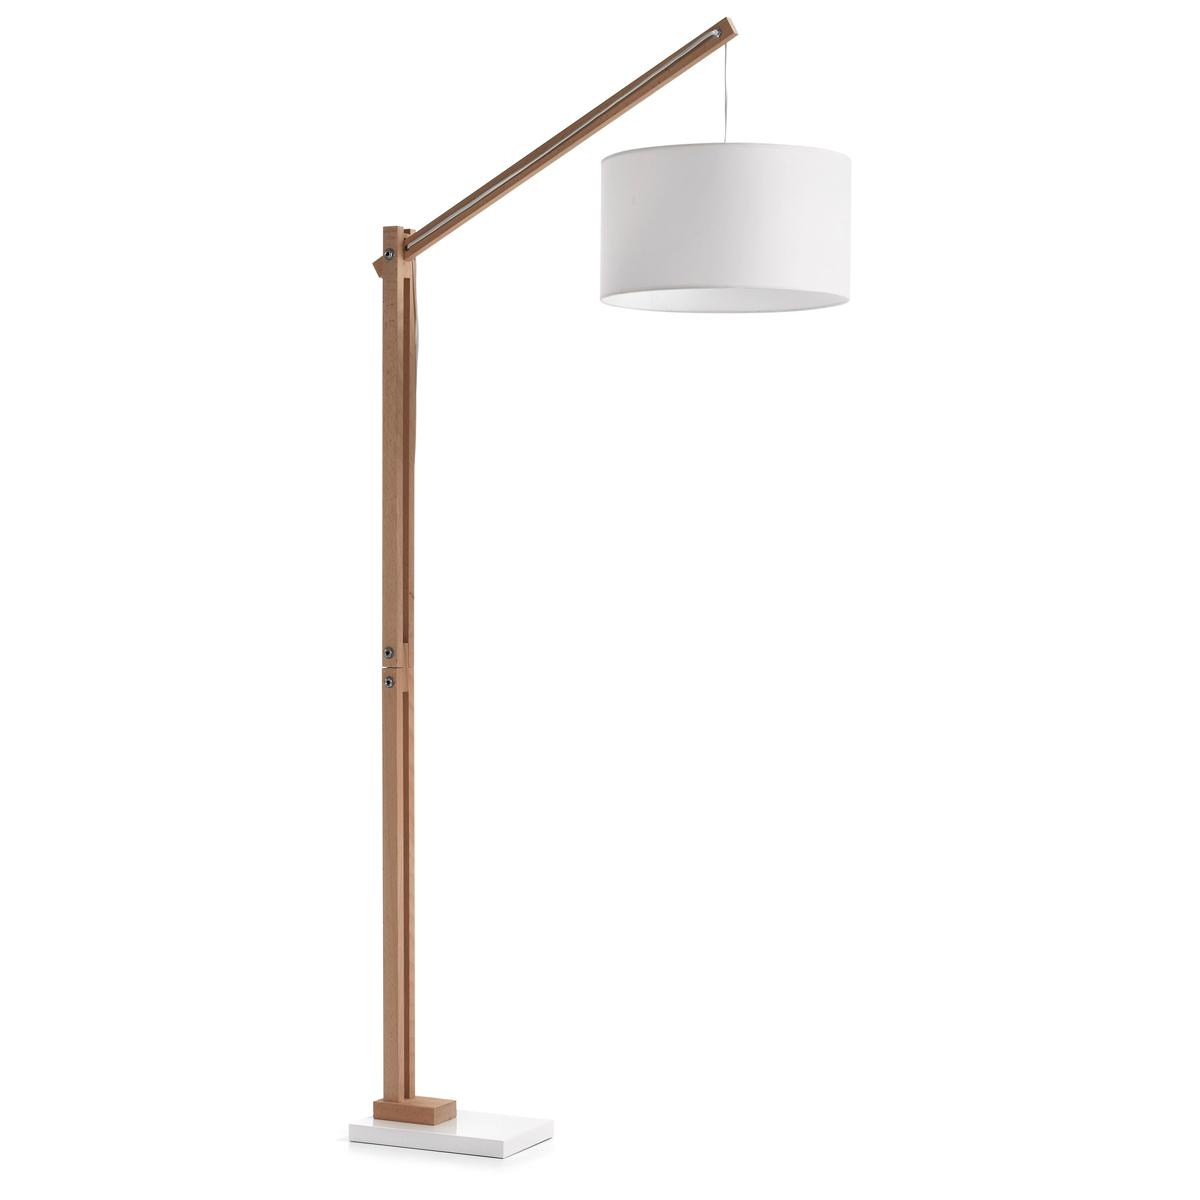 Stehlampe Holz Lampe Industrielle